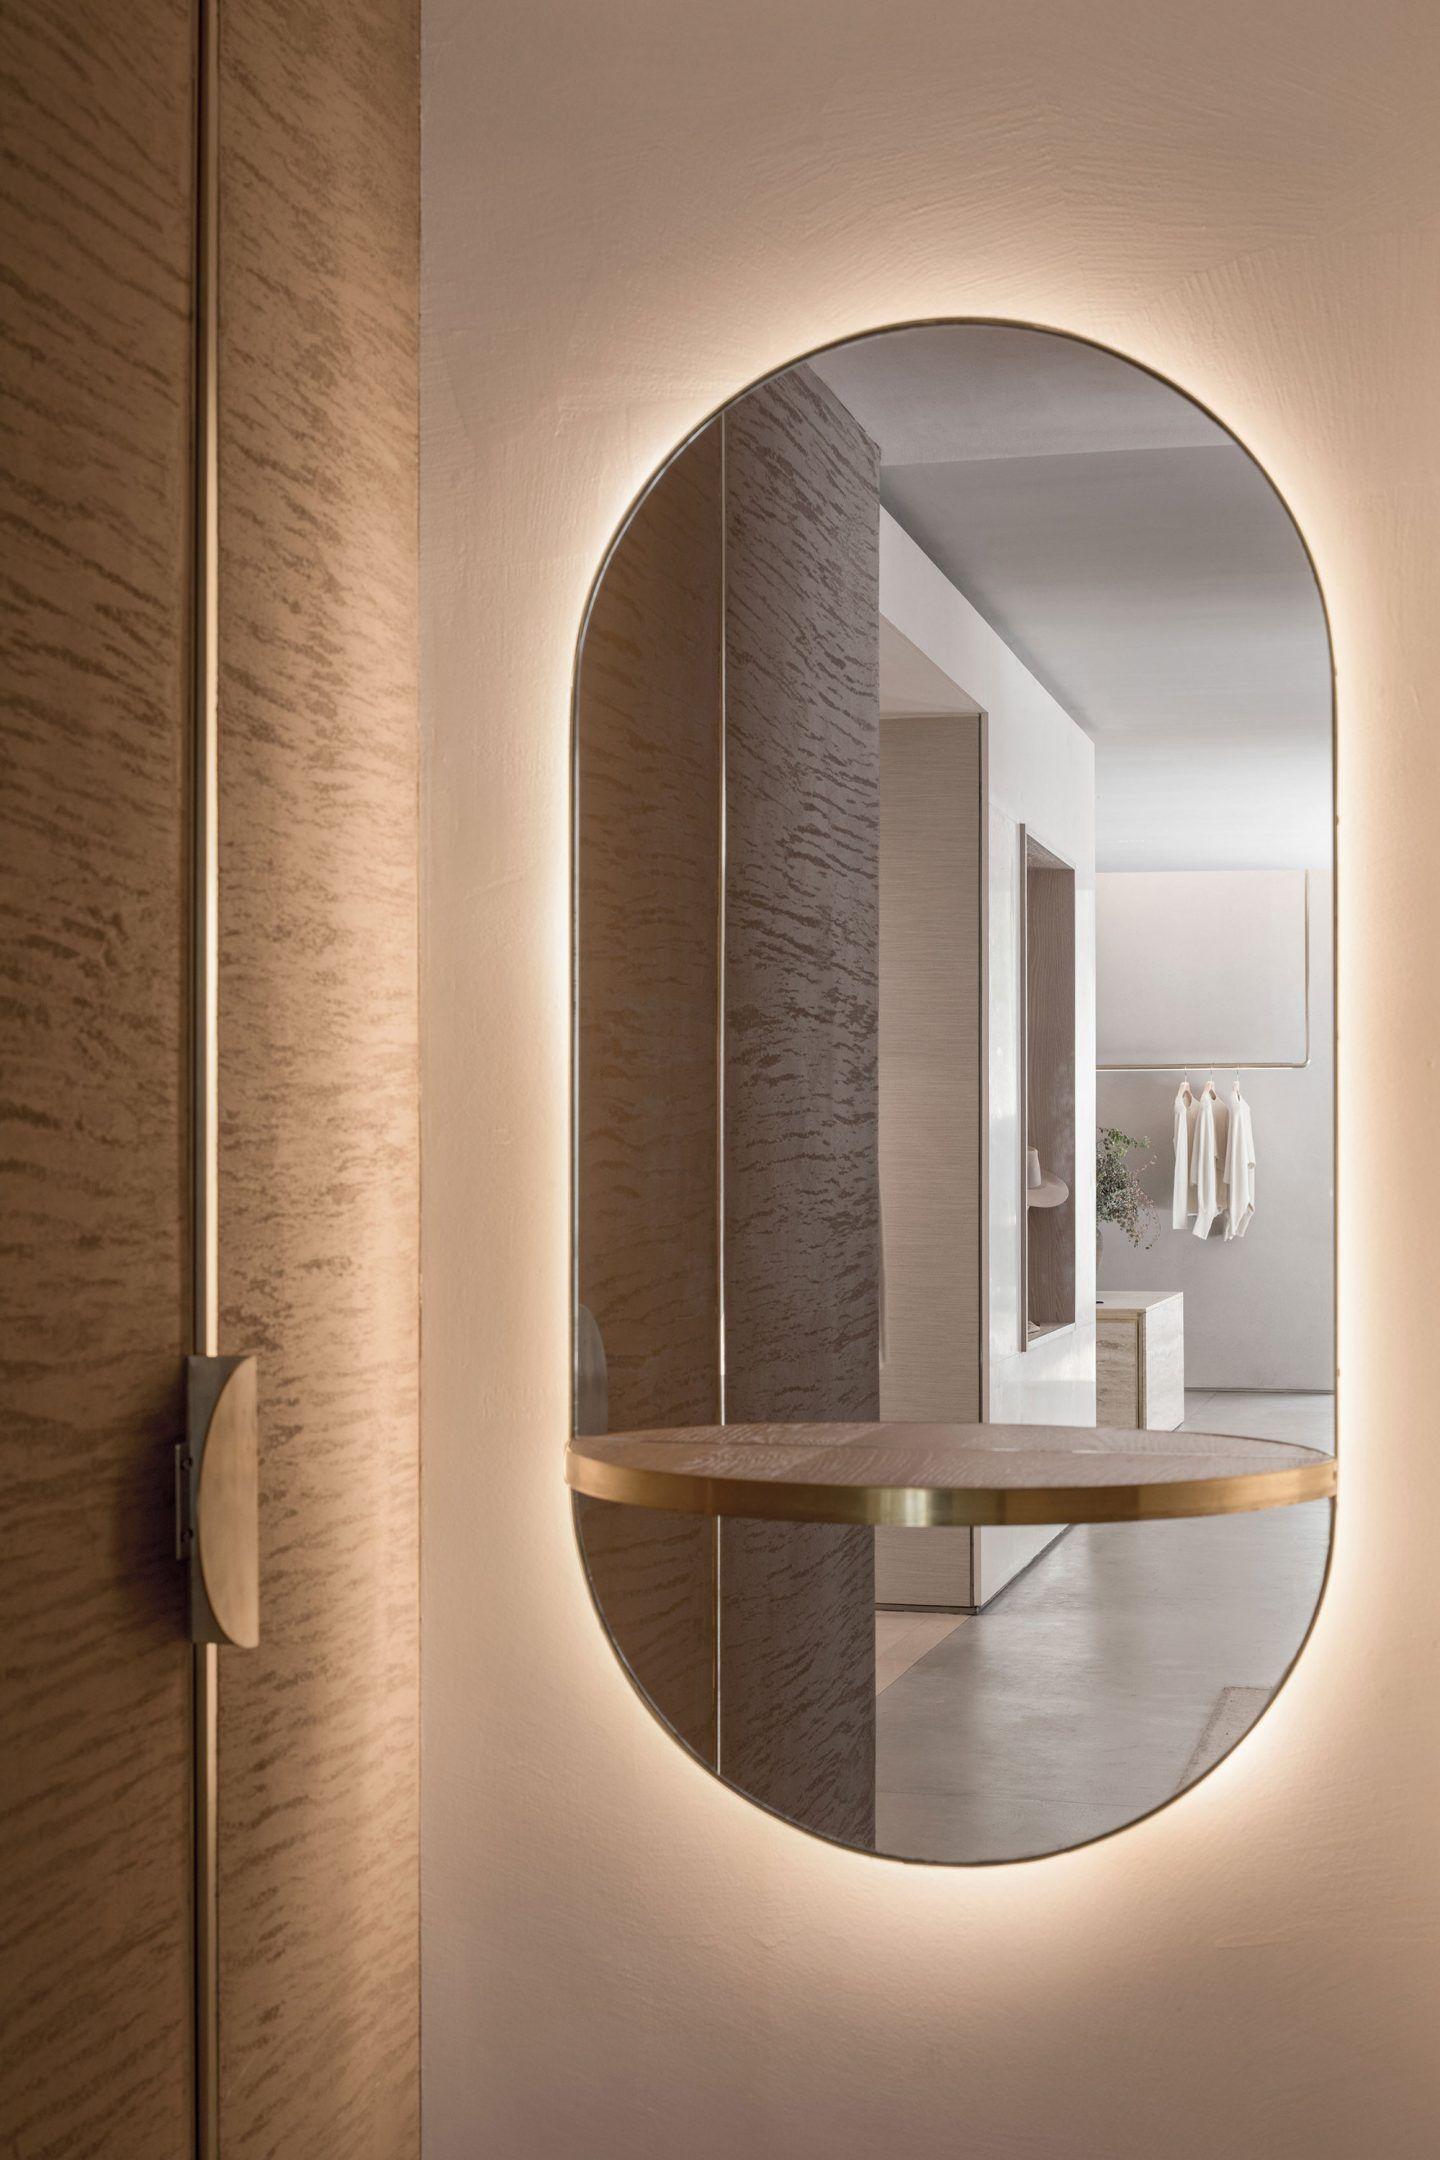 IGNANT-Architecture-Lukstudio-An-Urban-Retreat-22